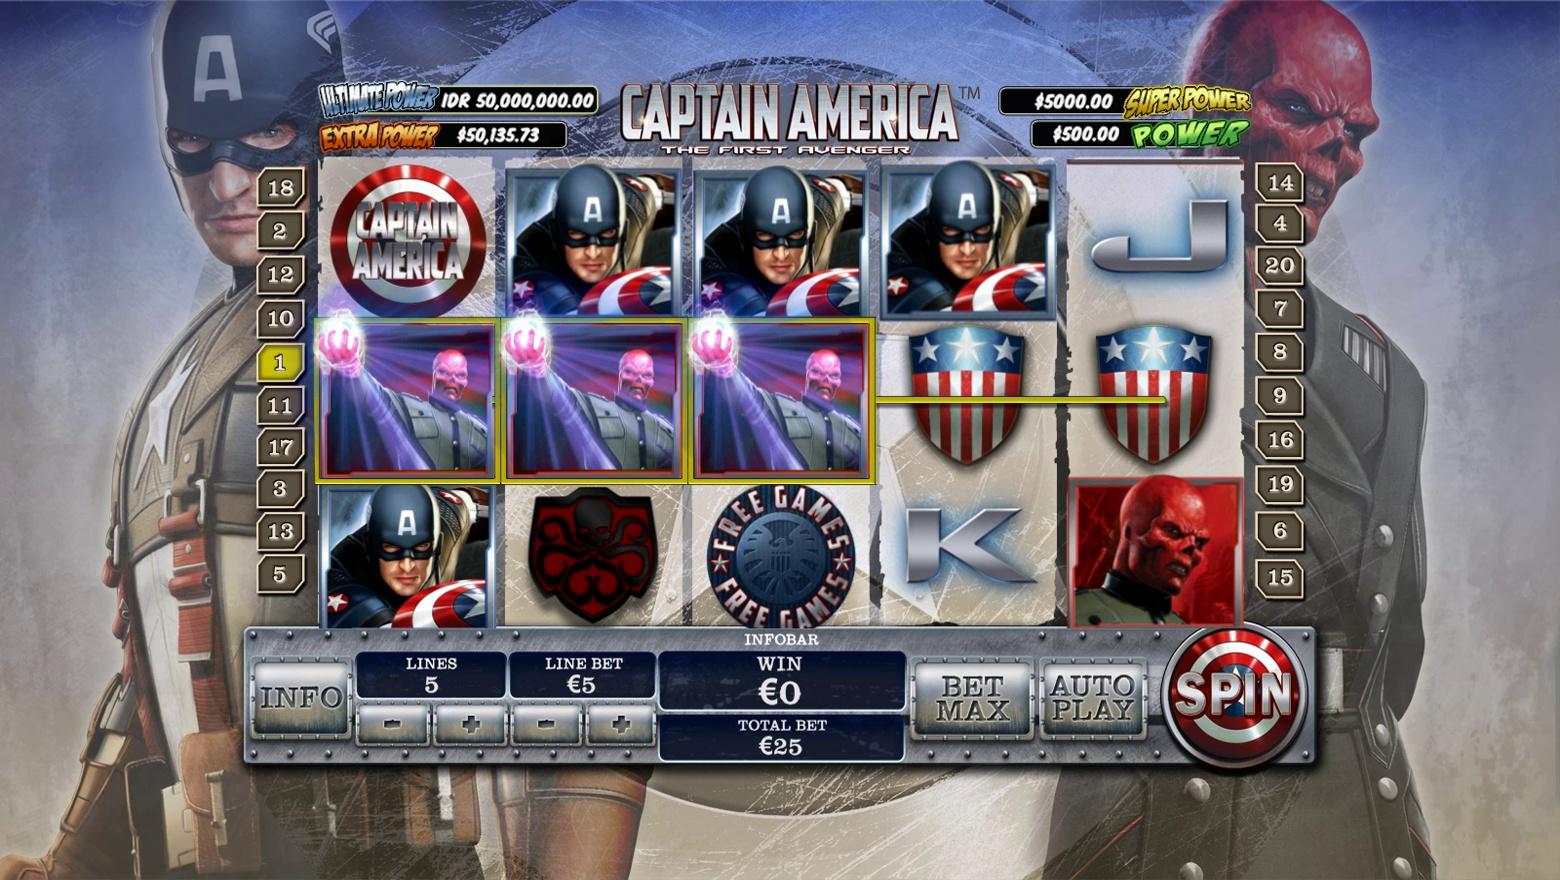 CAPTAIN AMERICA New Slot game